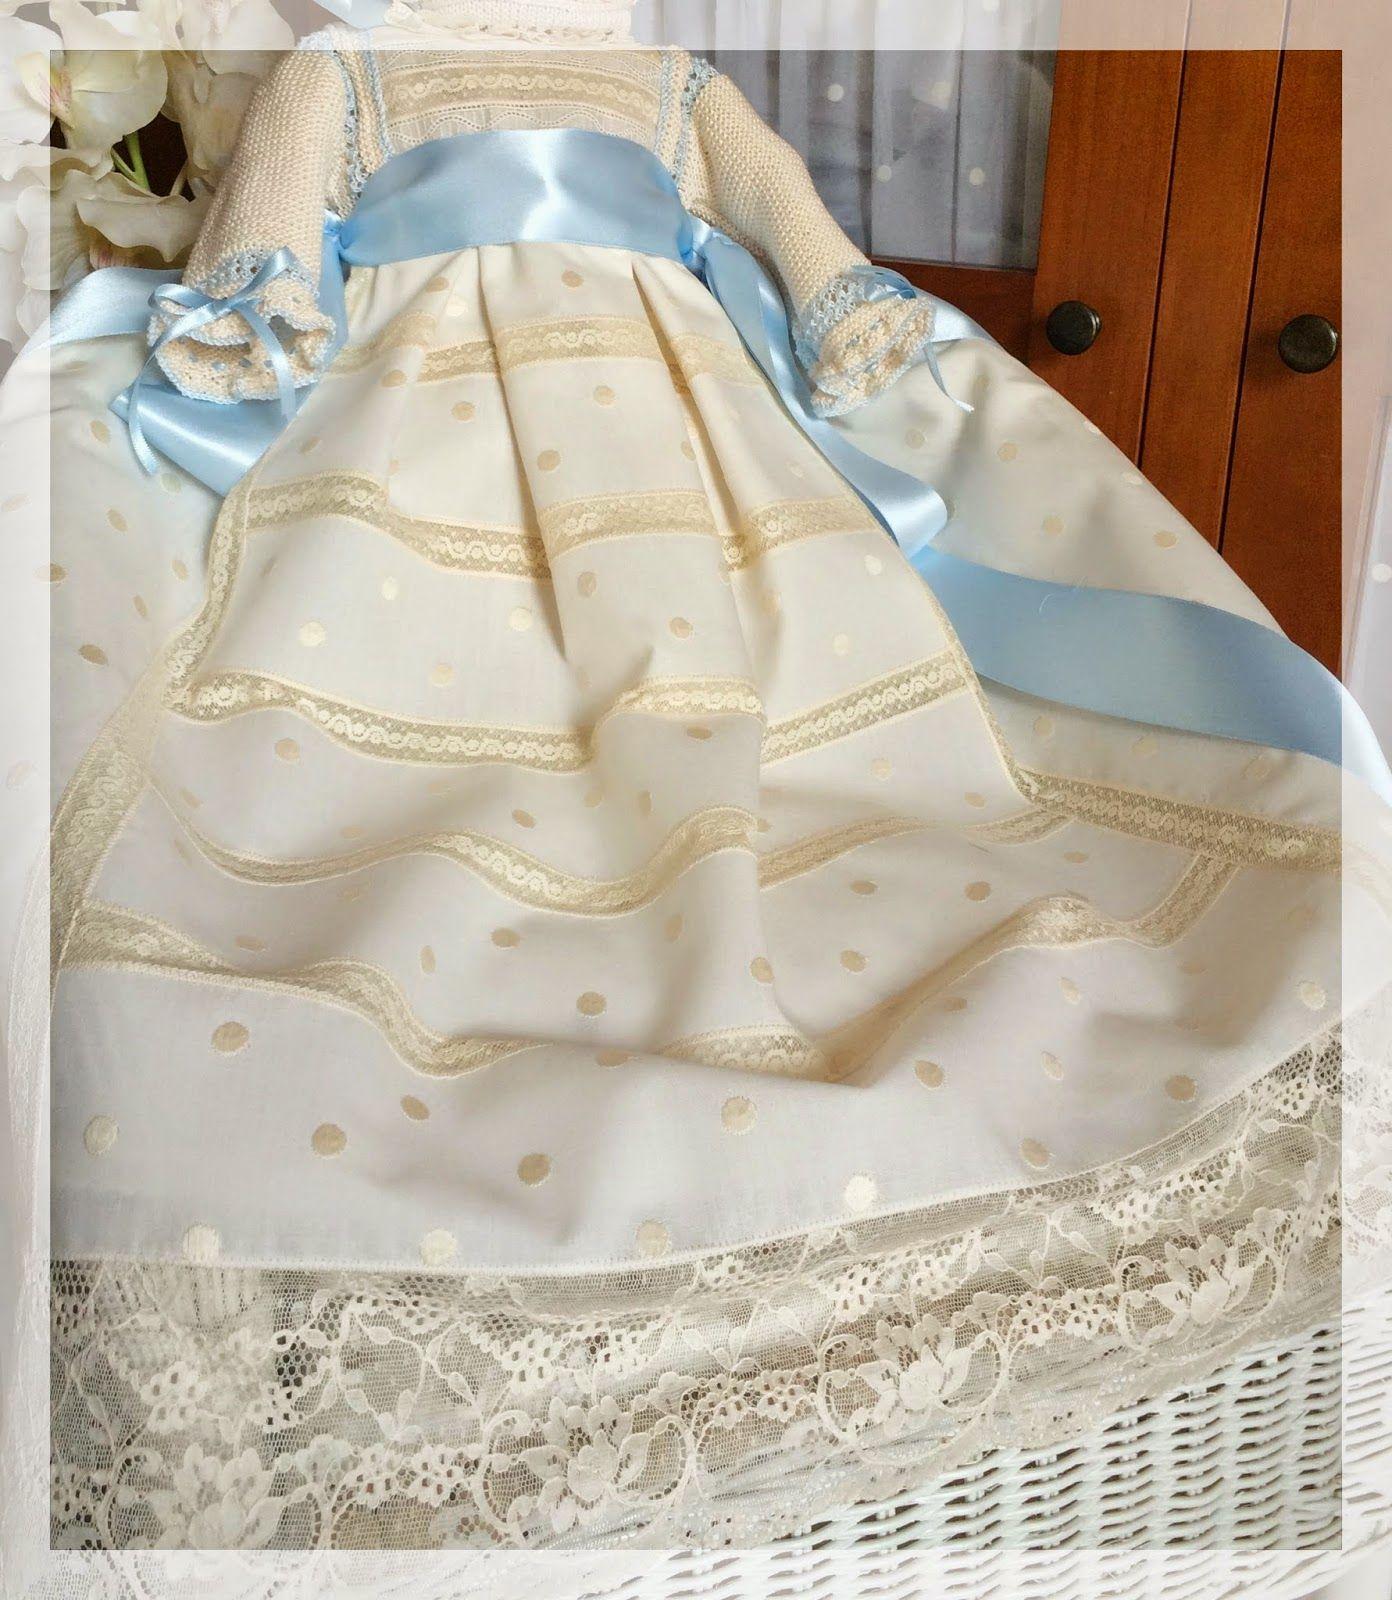 Canastilla artesanal fald n bautizo pinterest - Canastilla artesanal bebe ...